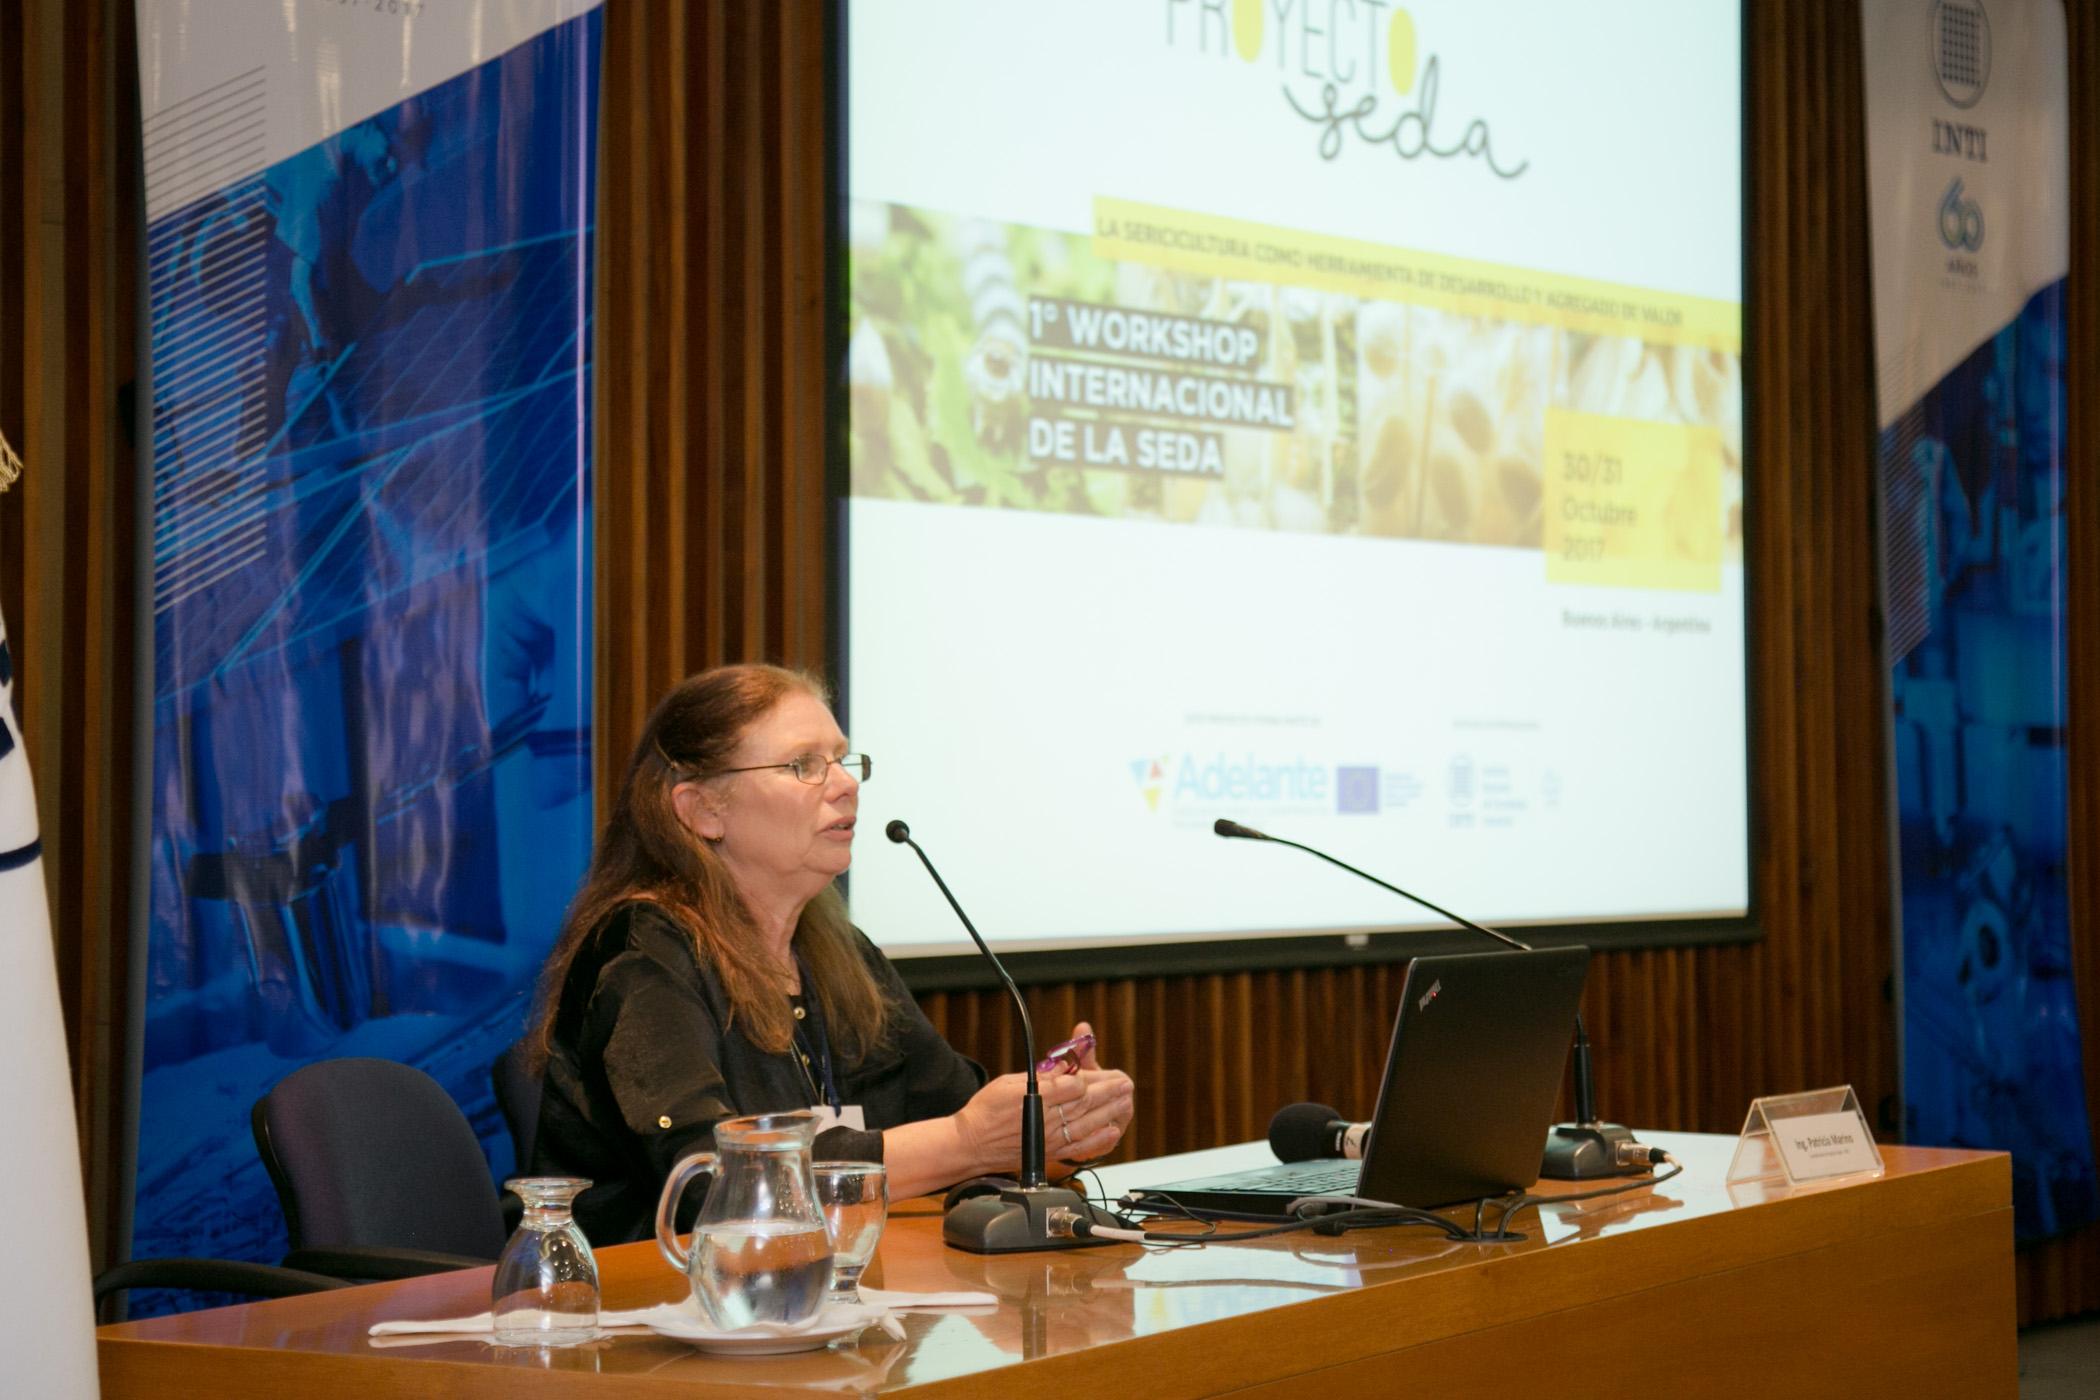 Ing. Patricia Marino, Directora del Proyecto Seda del INTI